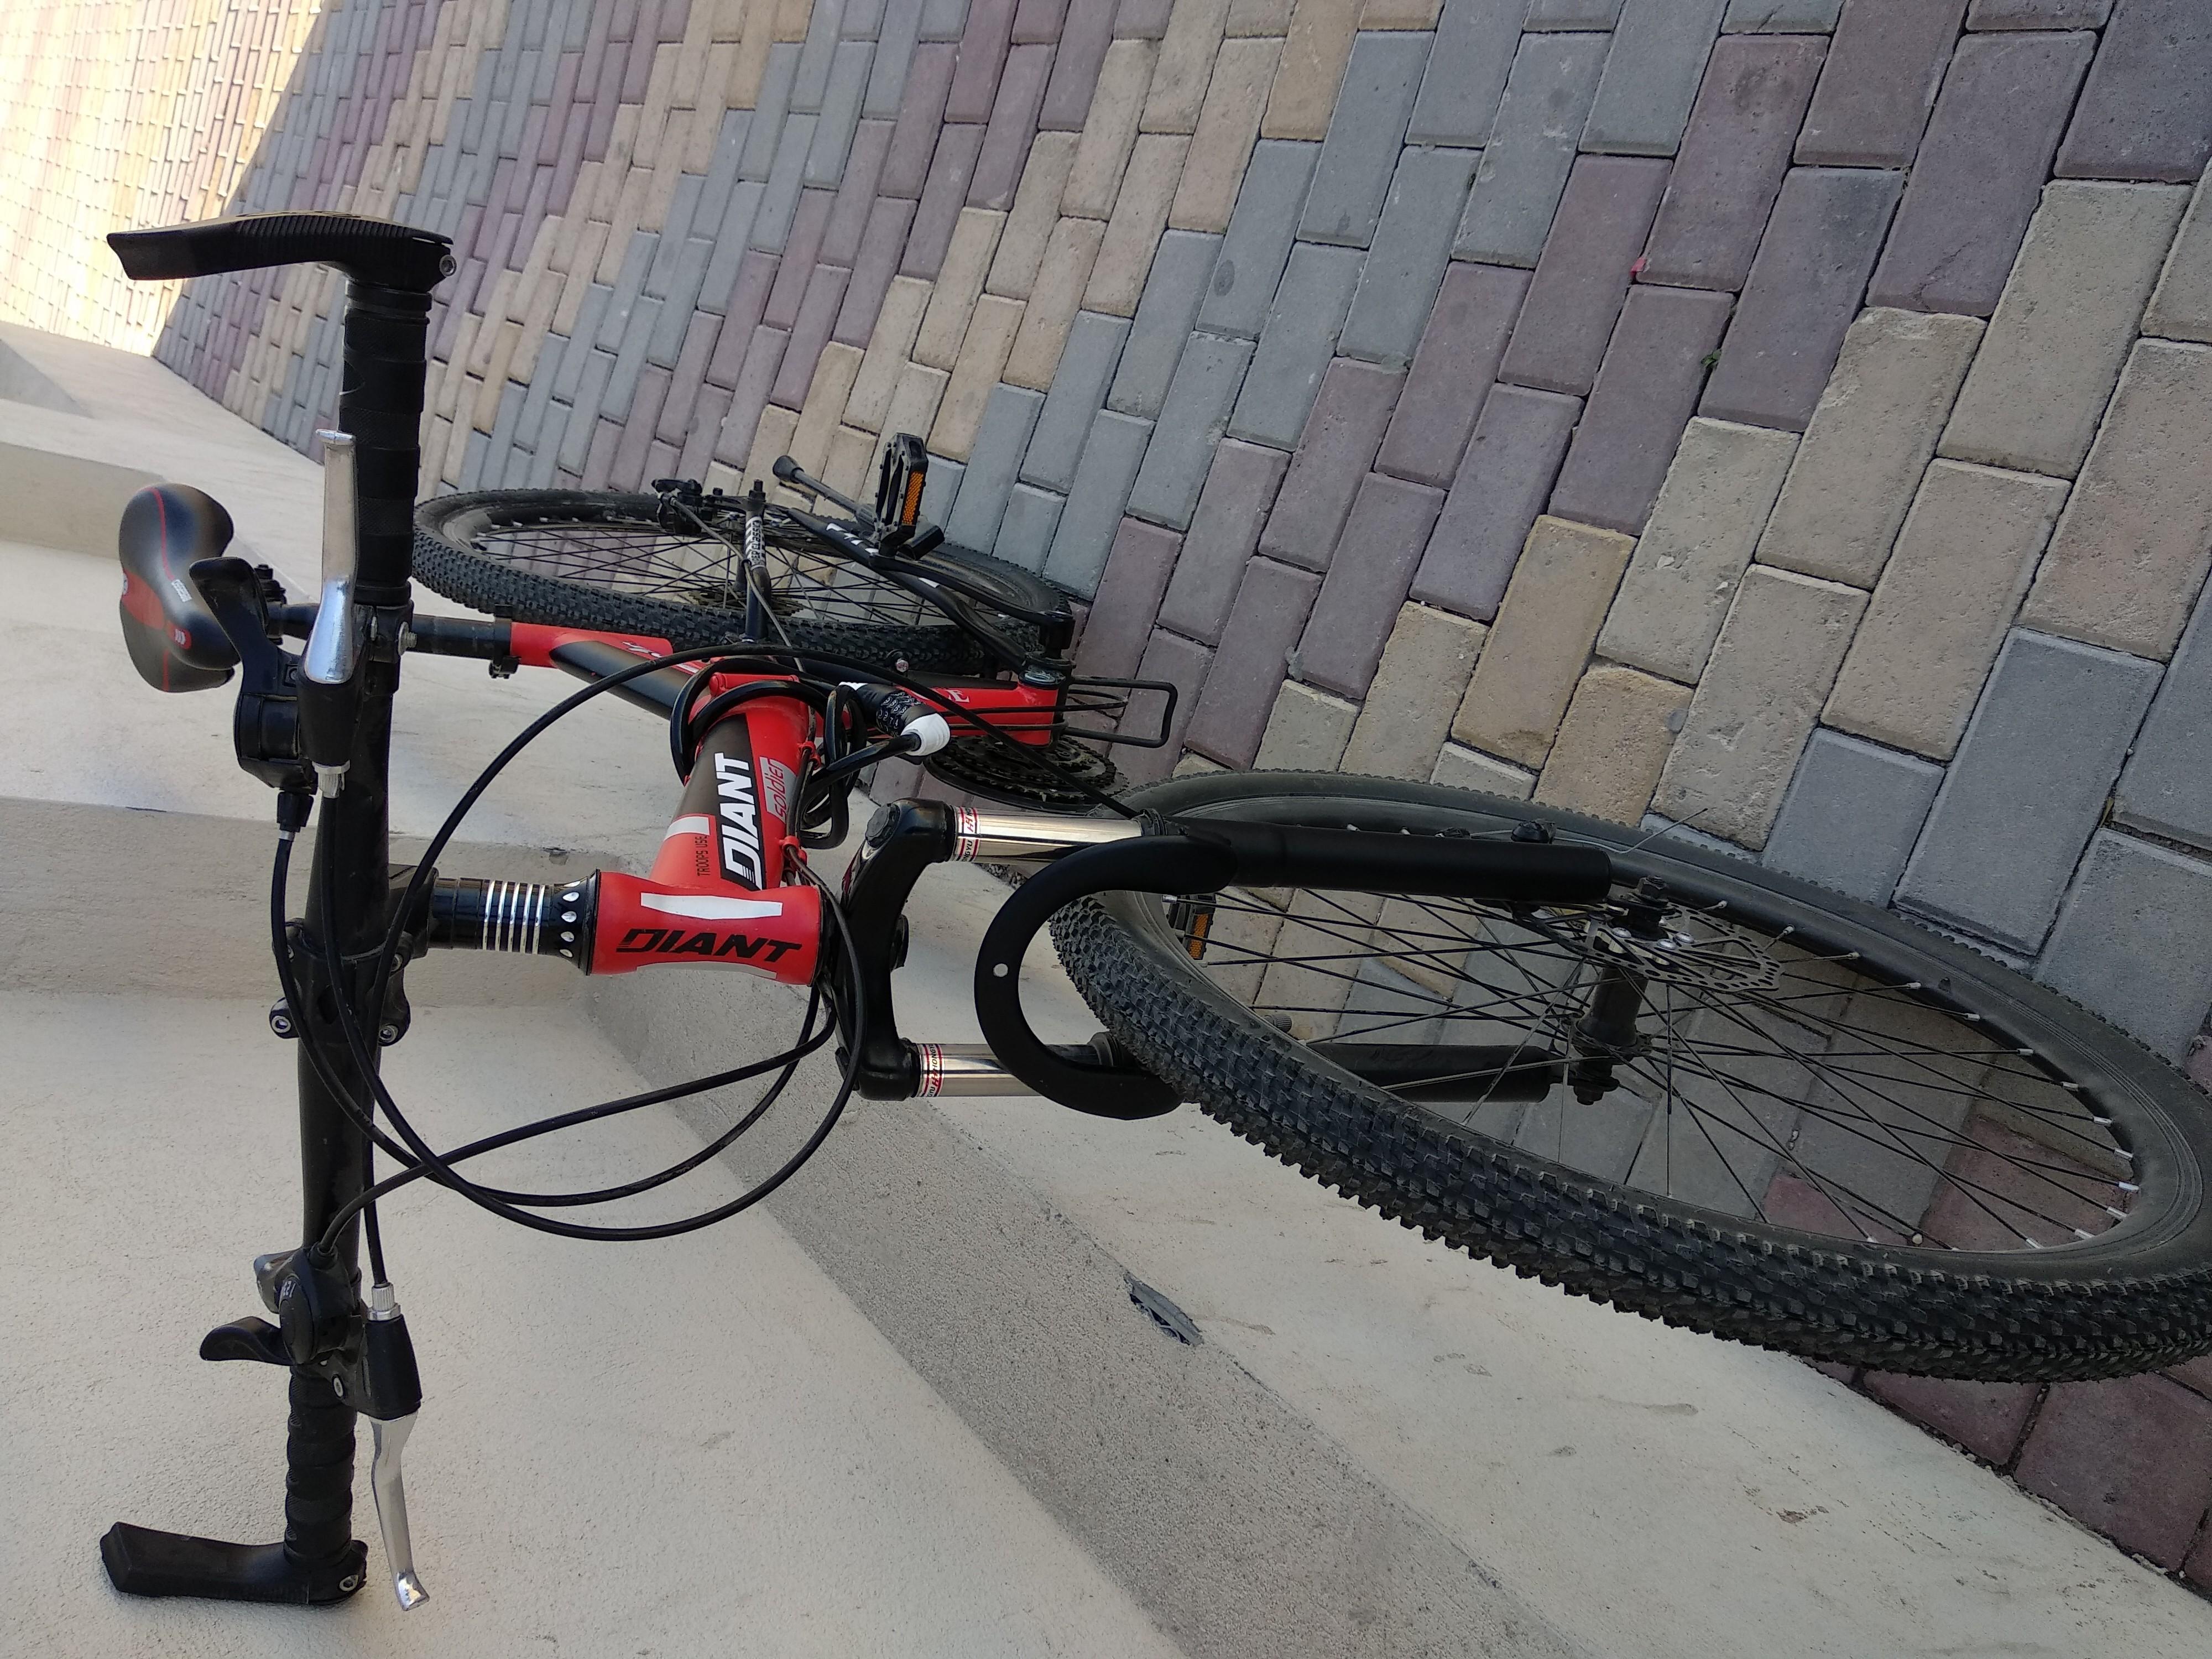 New foldable bike